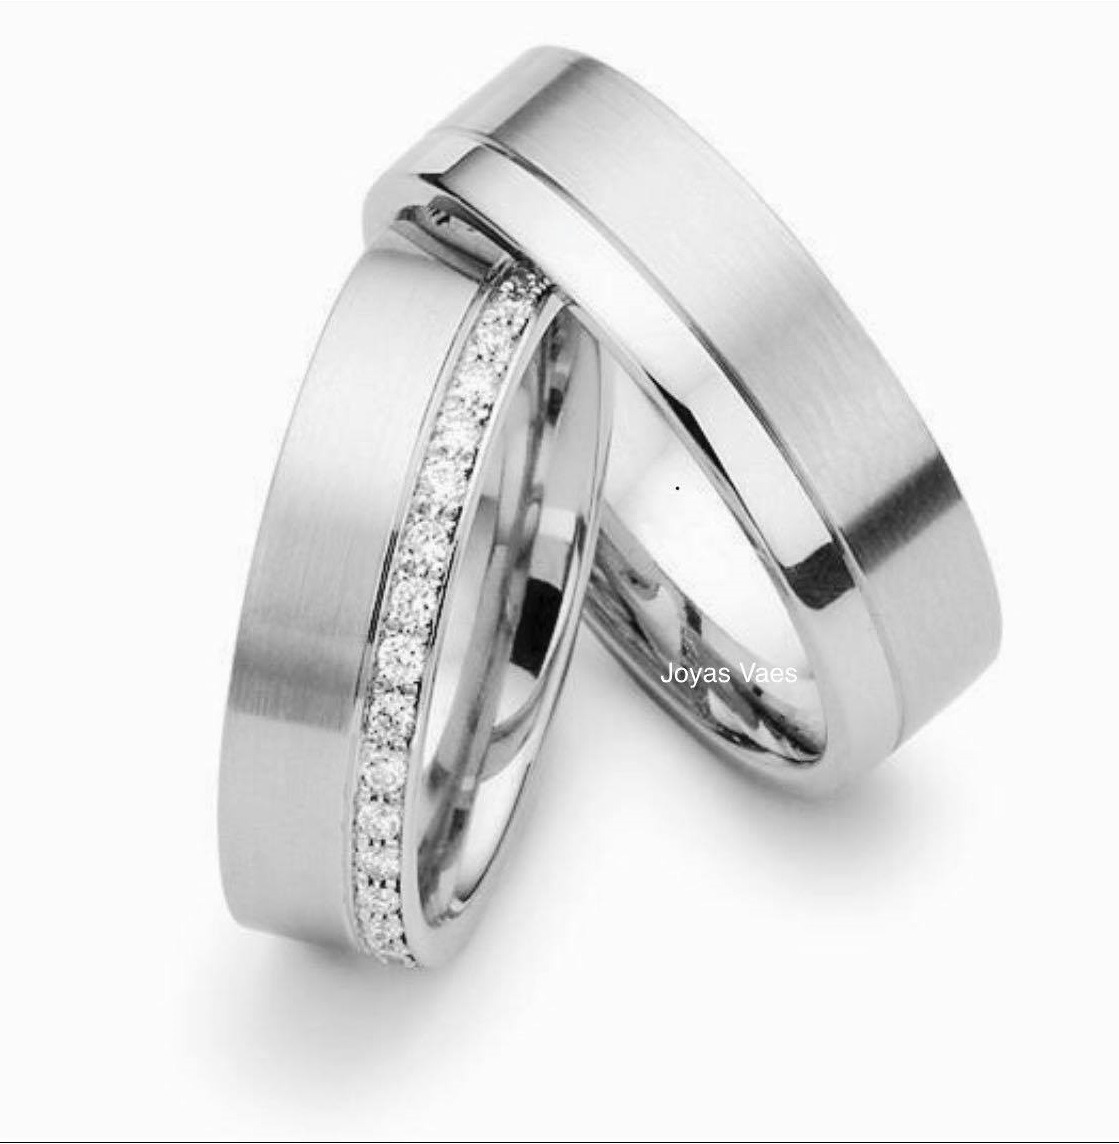 dd23d5fd8b06 argollas matrimonio oro 18k linea piedras confort fit. Cargando zoom.